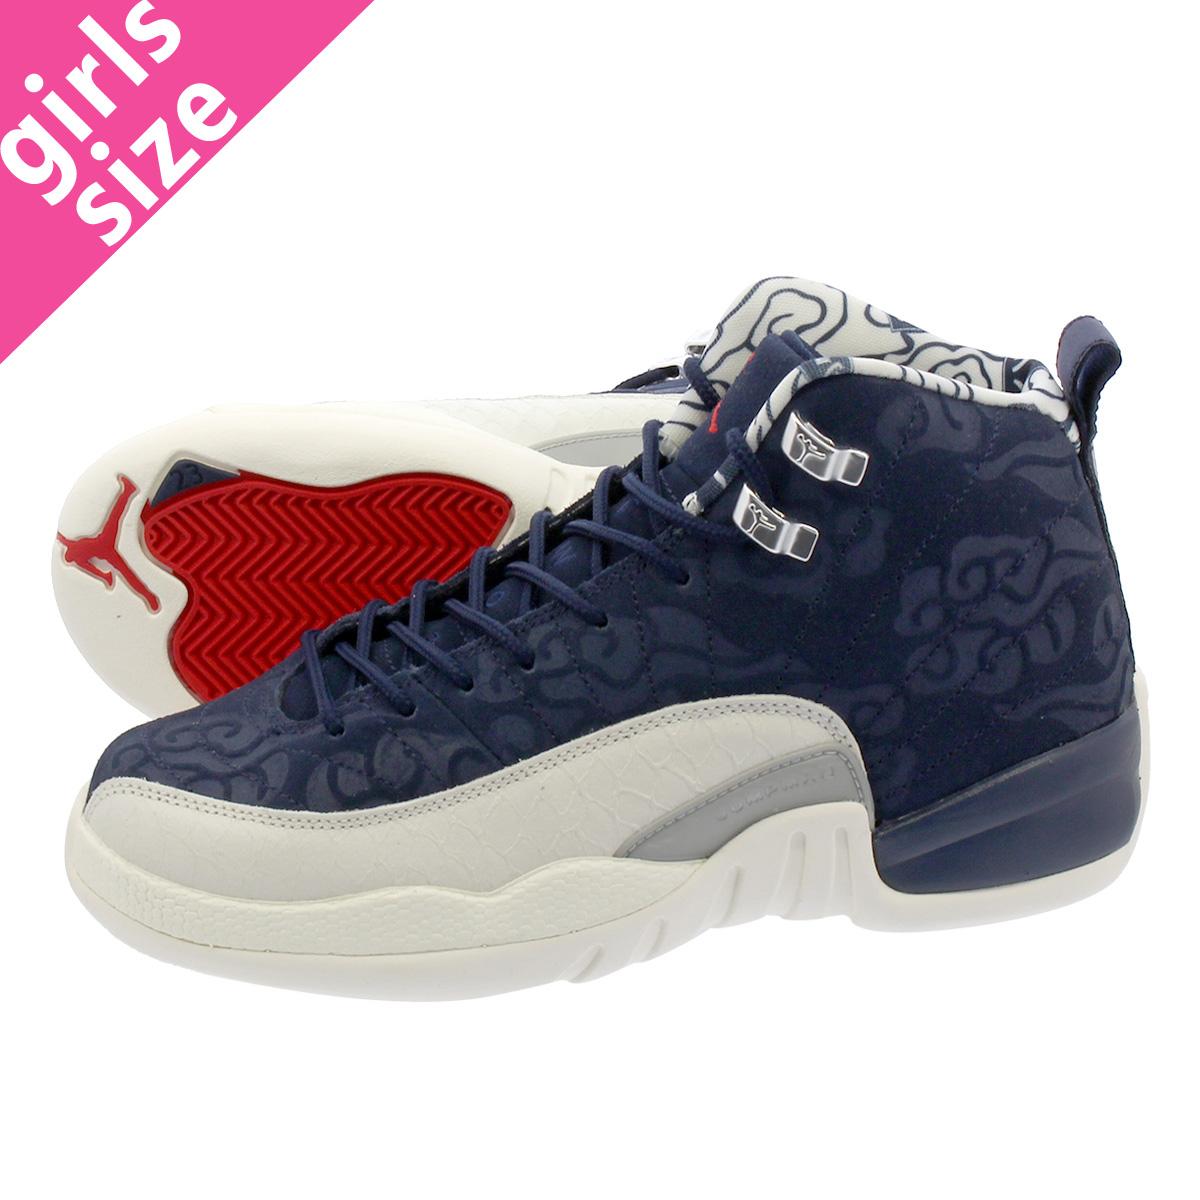 6c01eff6c01e86 NIKE AIR JORDAN 12 RETRO GS Nike Air Jordan 12 nostalgic GS COLLEGE  NAVY SAIL UNIVERSITY RED bv8017-445